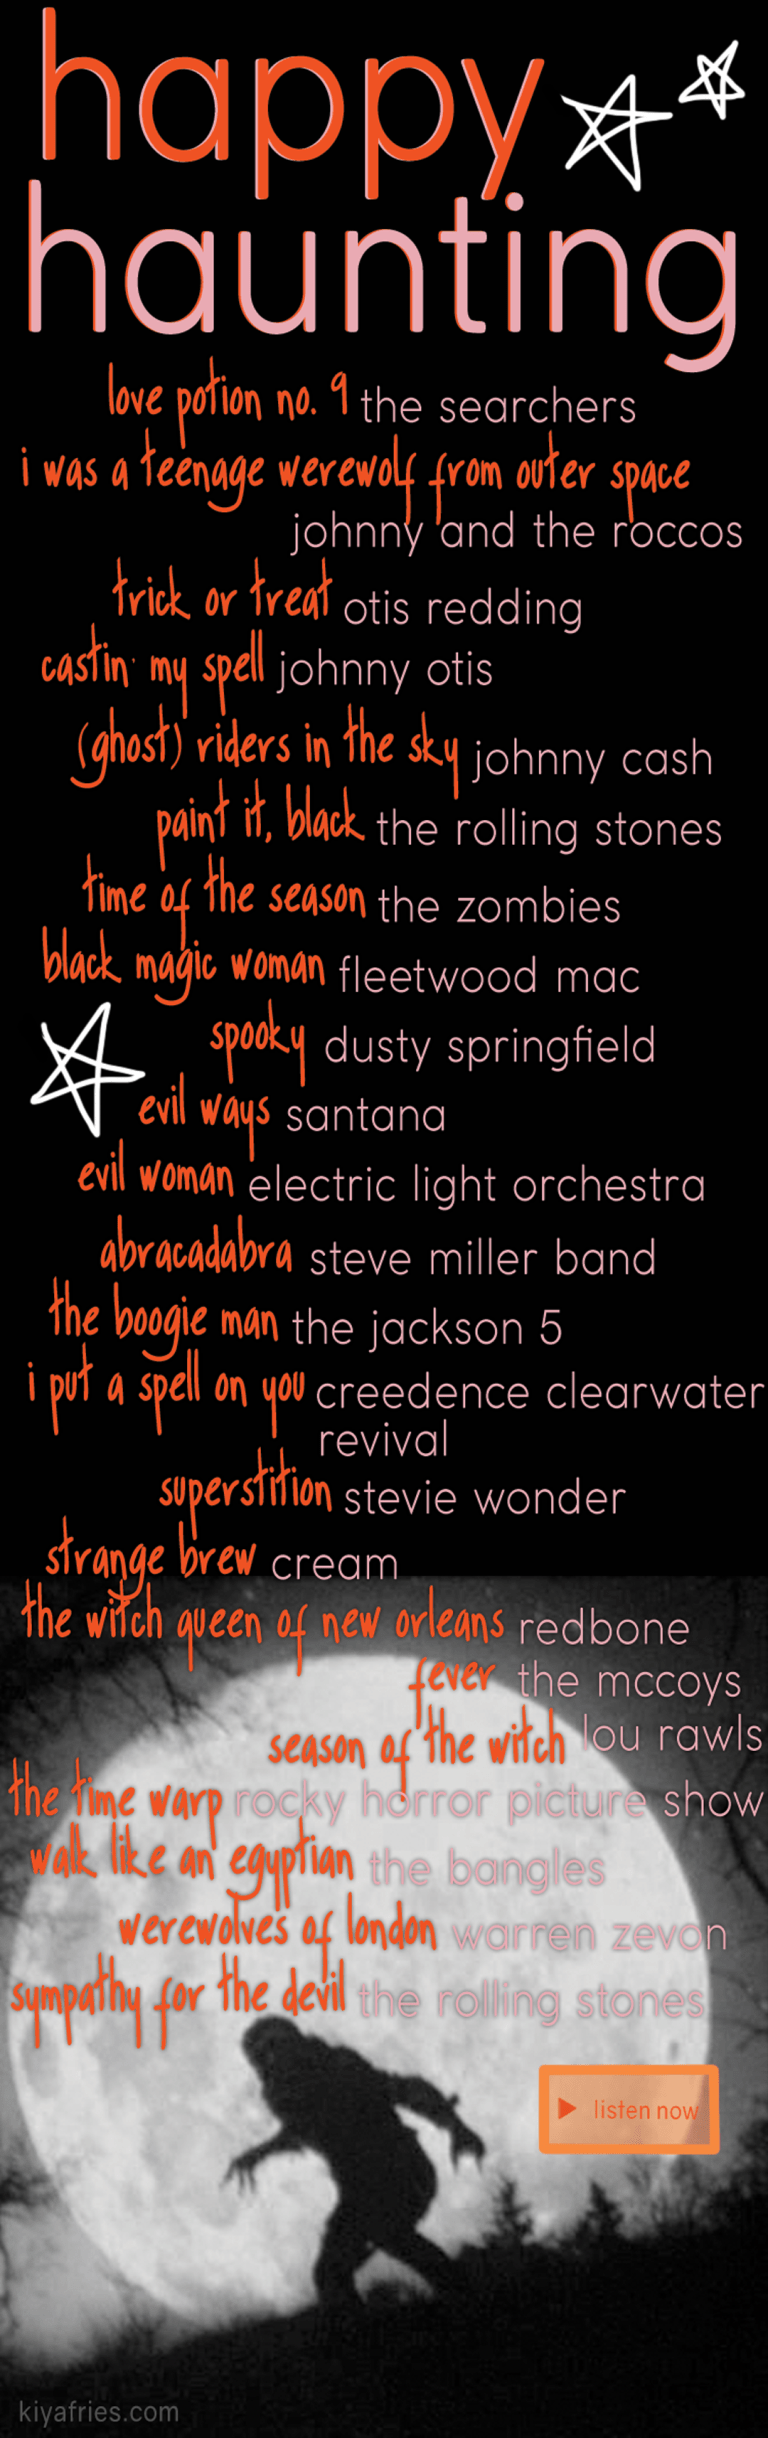 Holiday Music 5 Unique Halloween Playlists Kiyafries In 2020 Halloween Playlist Halloween Music Unique Halloween